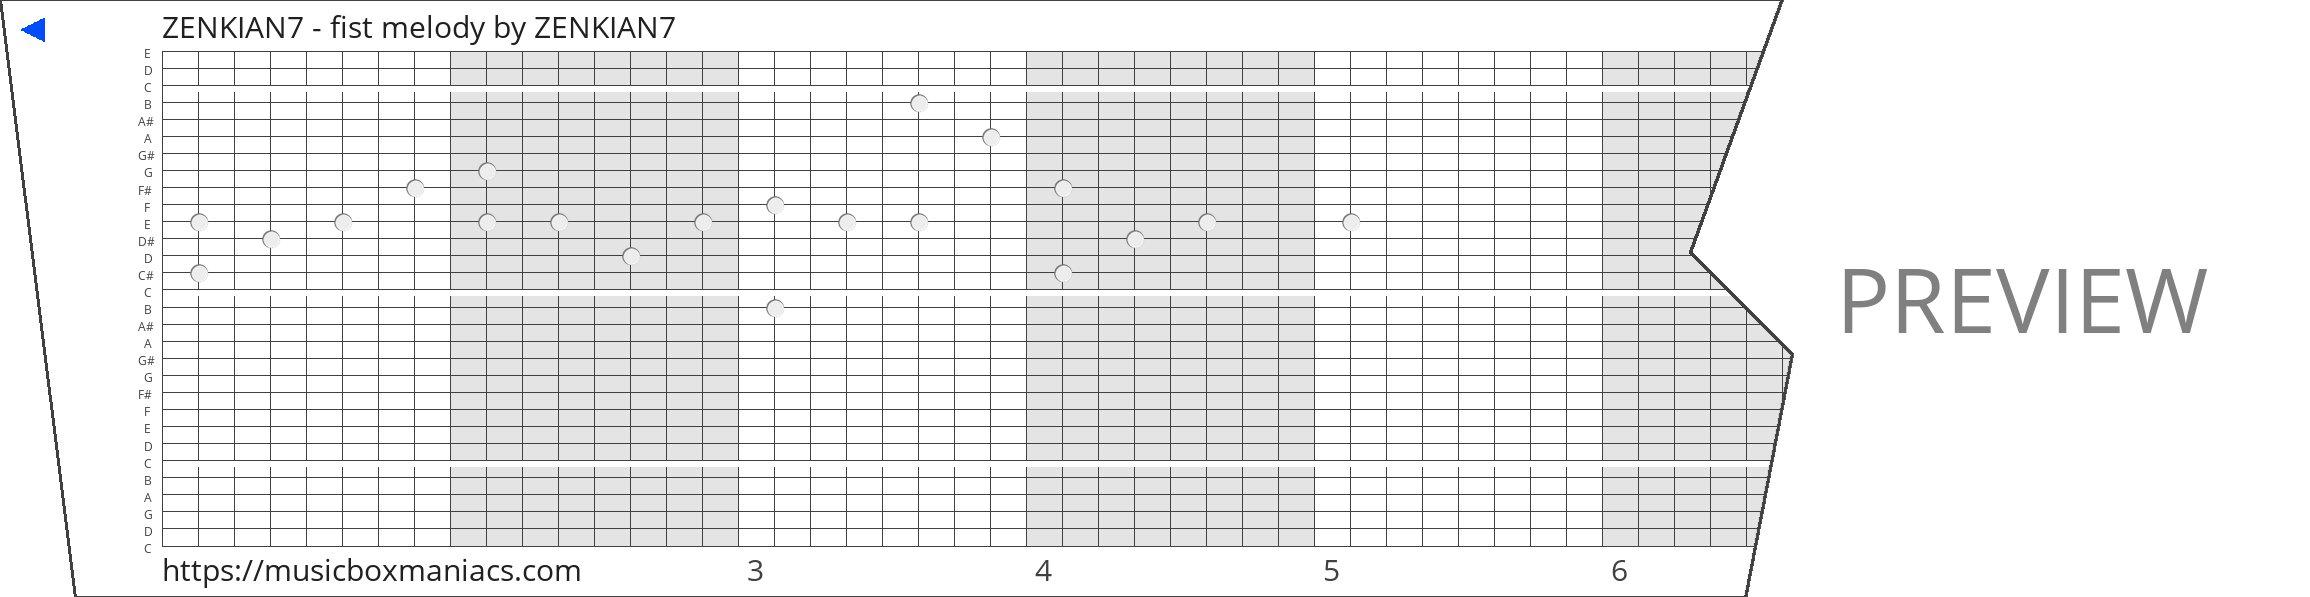 ZENKIAN7 - fist melody 30 note music box paper strip